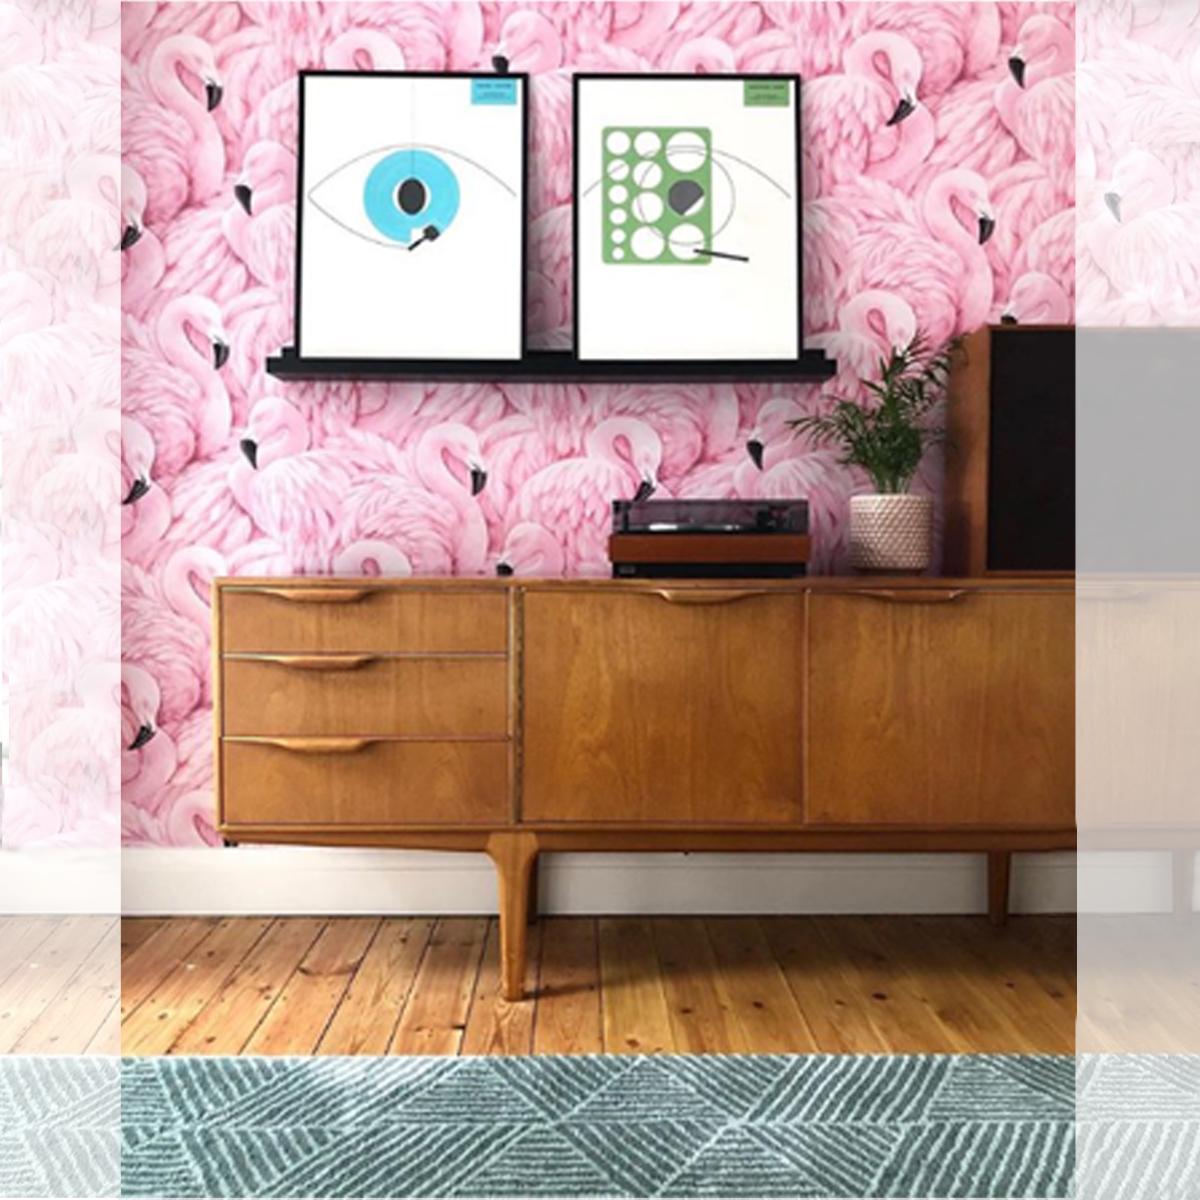 Pink Flamingo Wallpaper Instagram @diy_addict_146